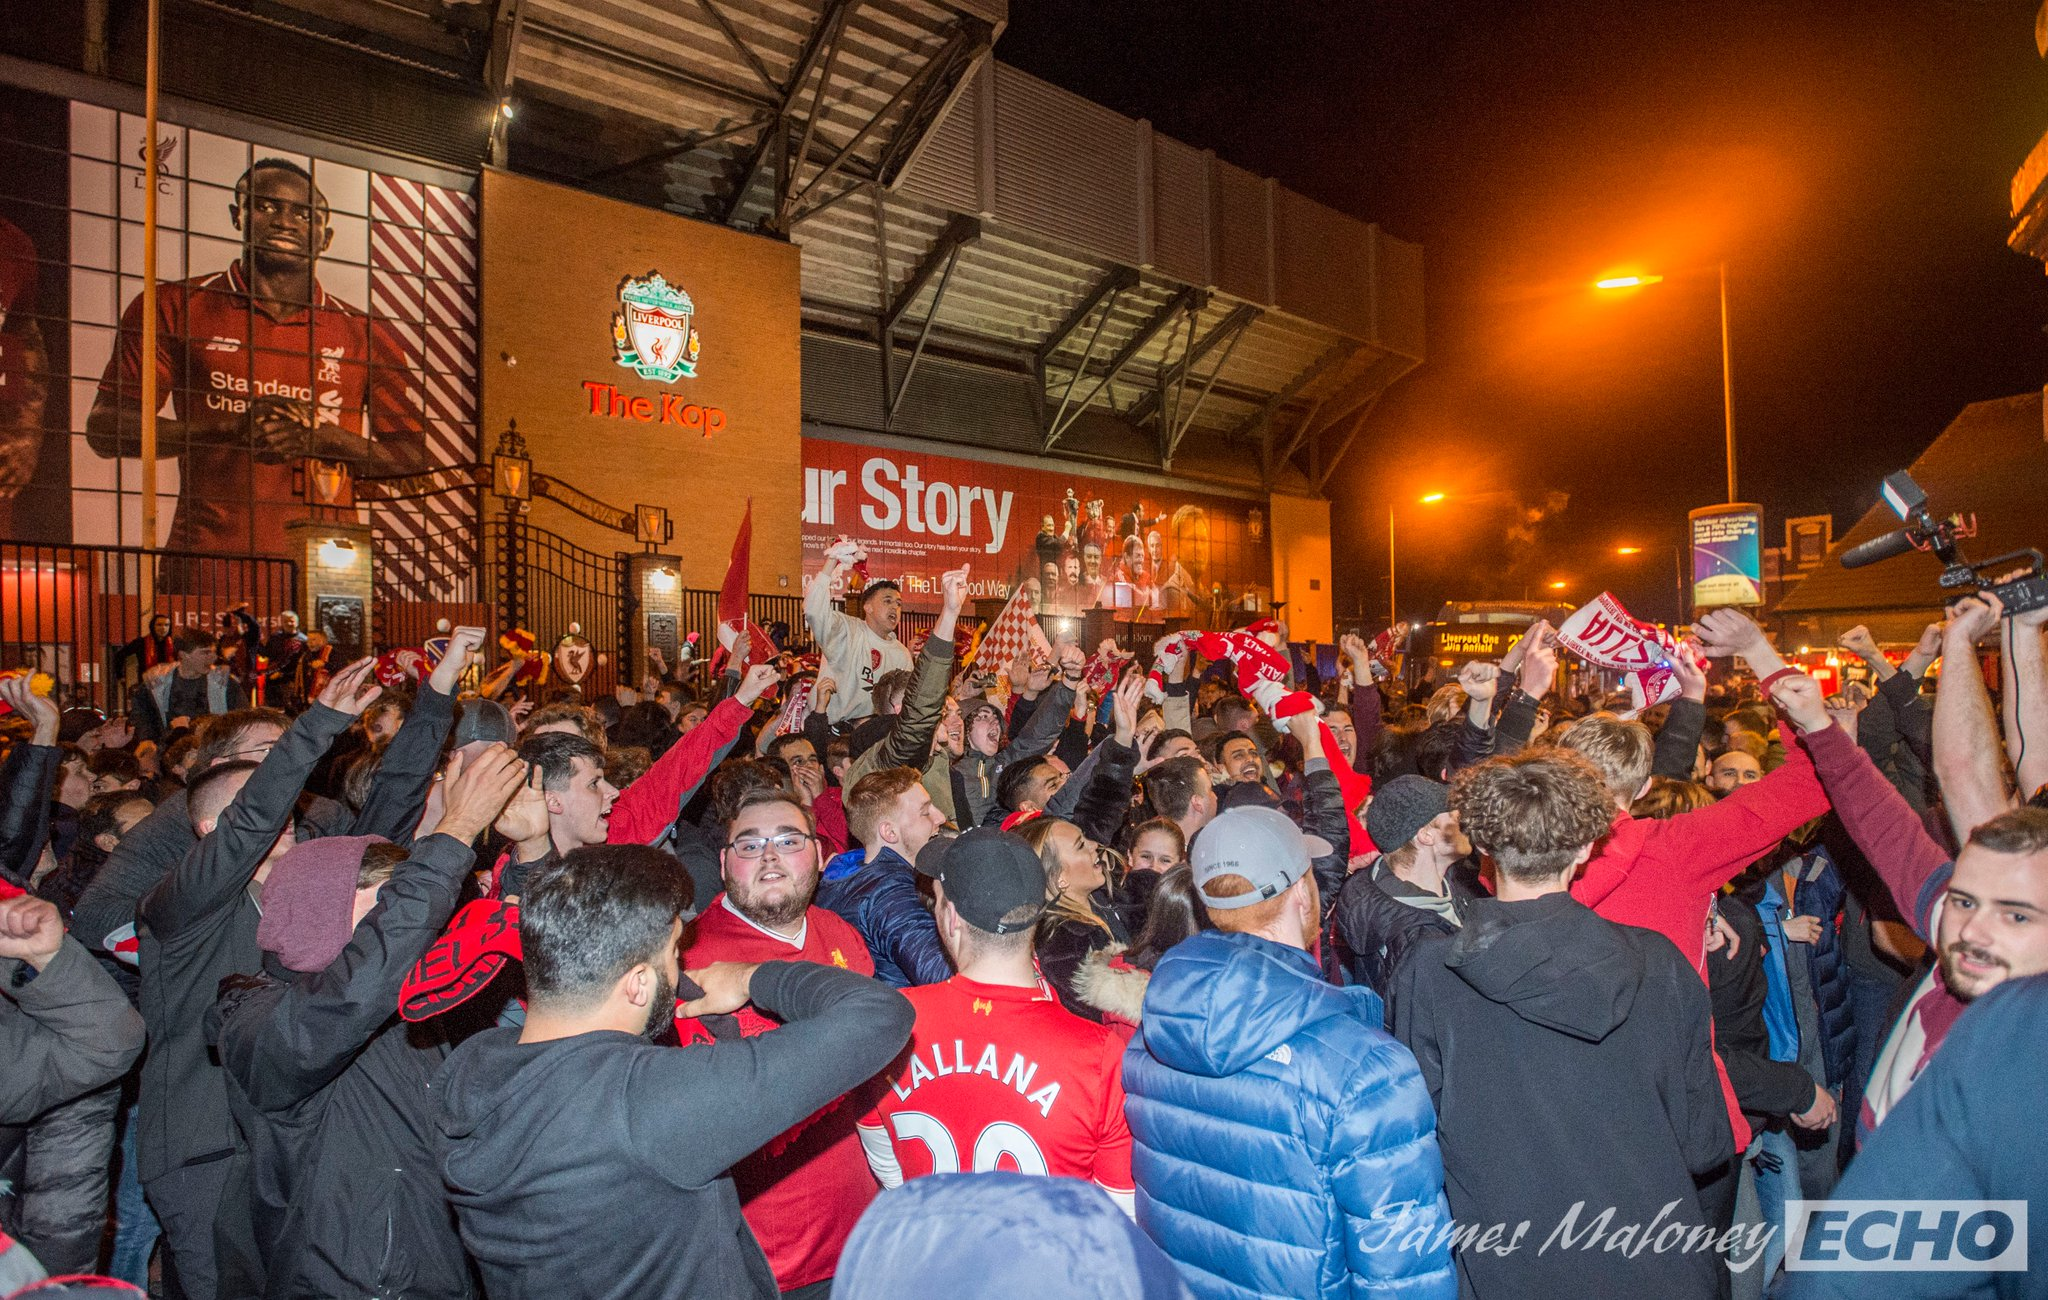 CĐV Liverpool tập trung ở Anfield mừng suất dự chung kết Champions League